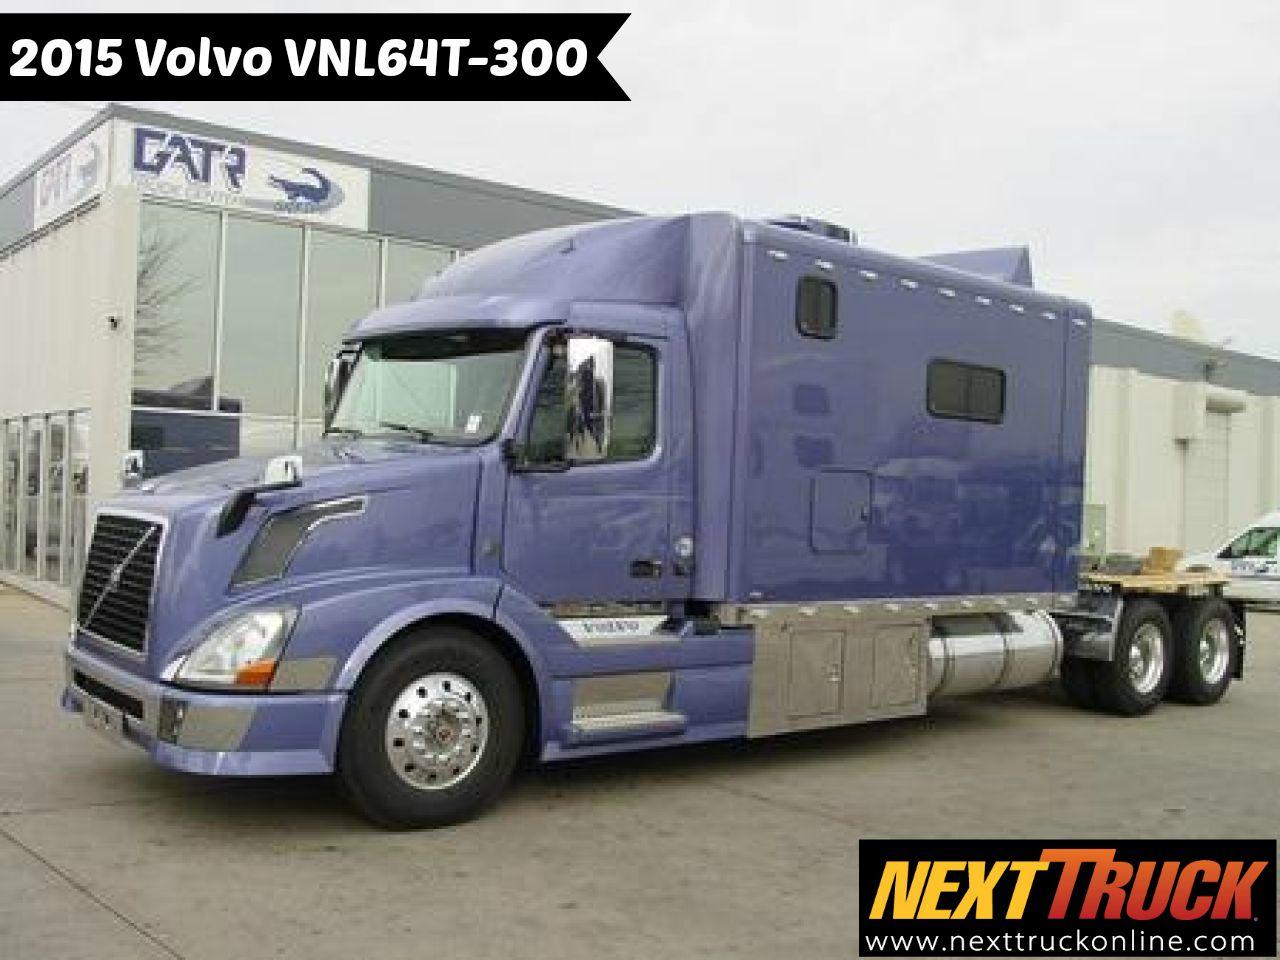 Pin by NextTruck on Featured Trucks Volvo trucks, Big